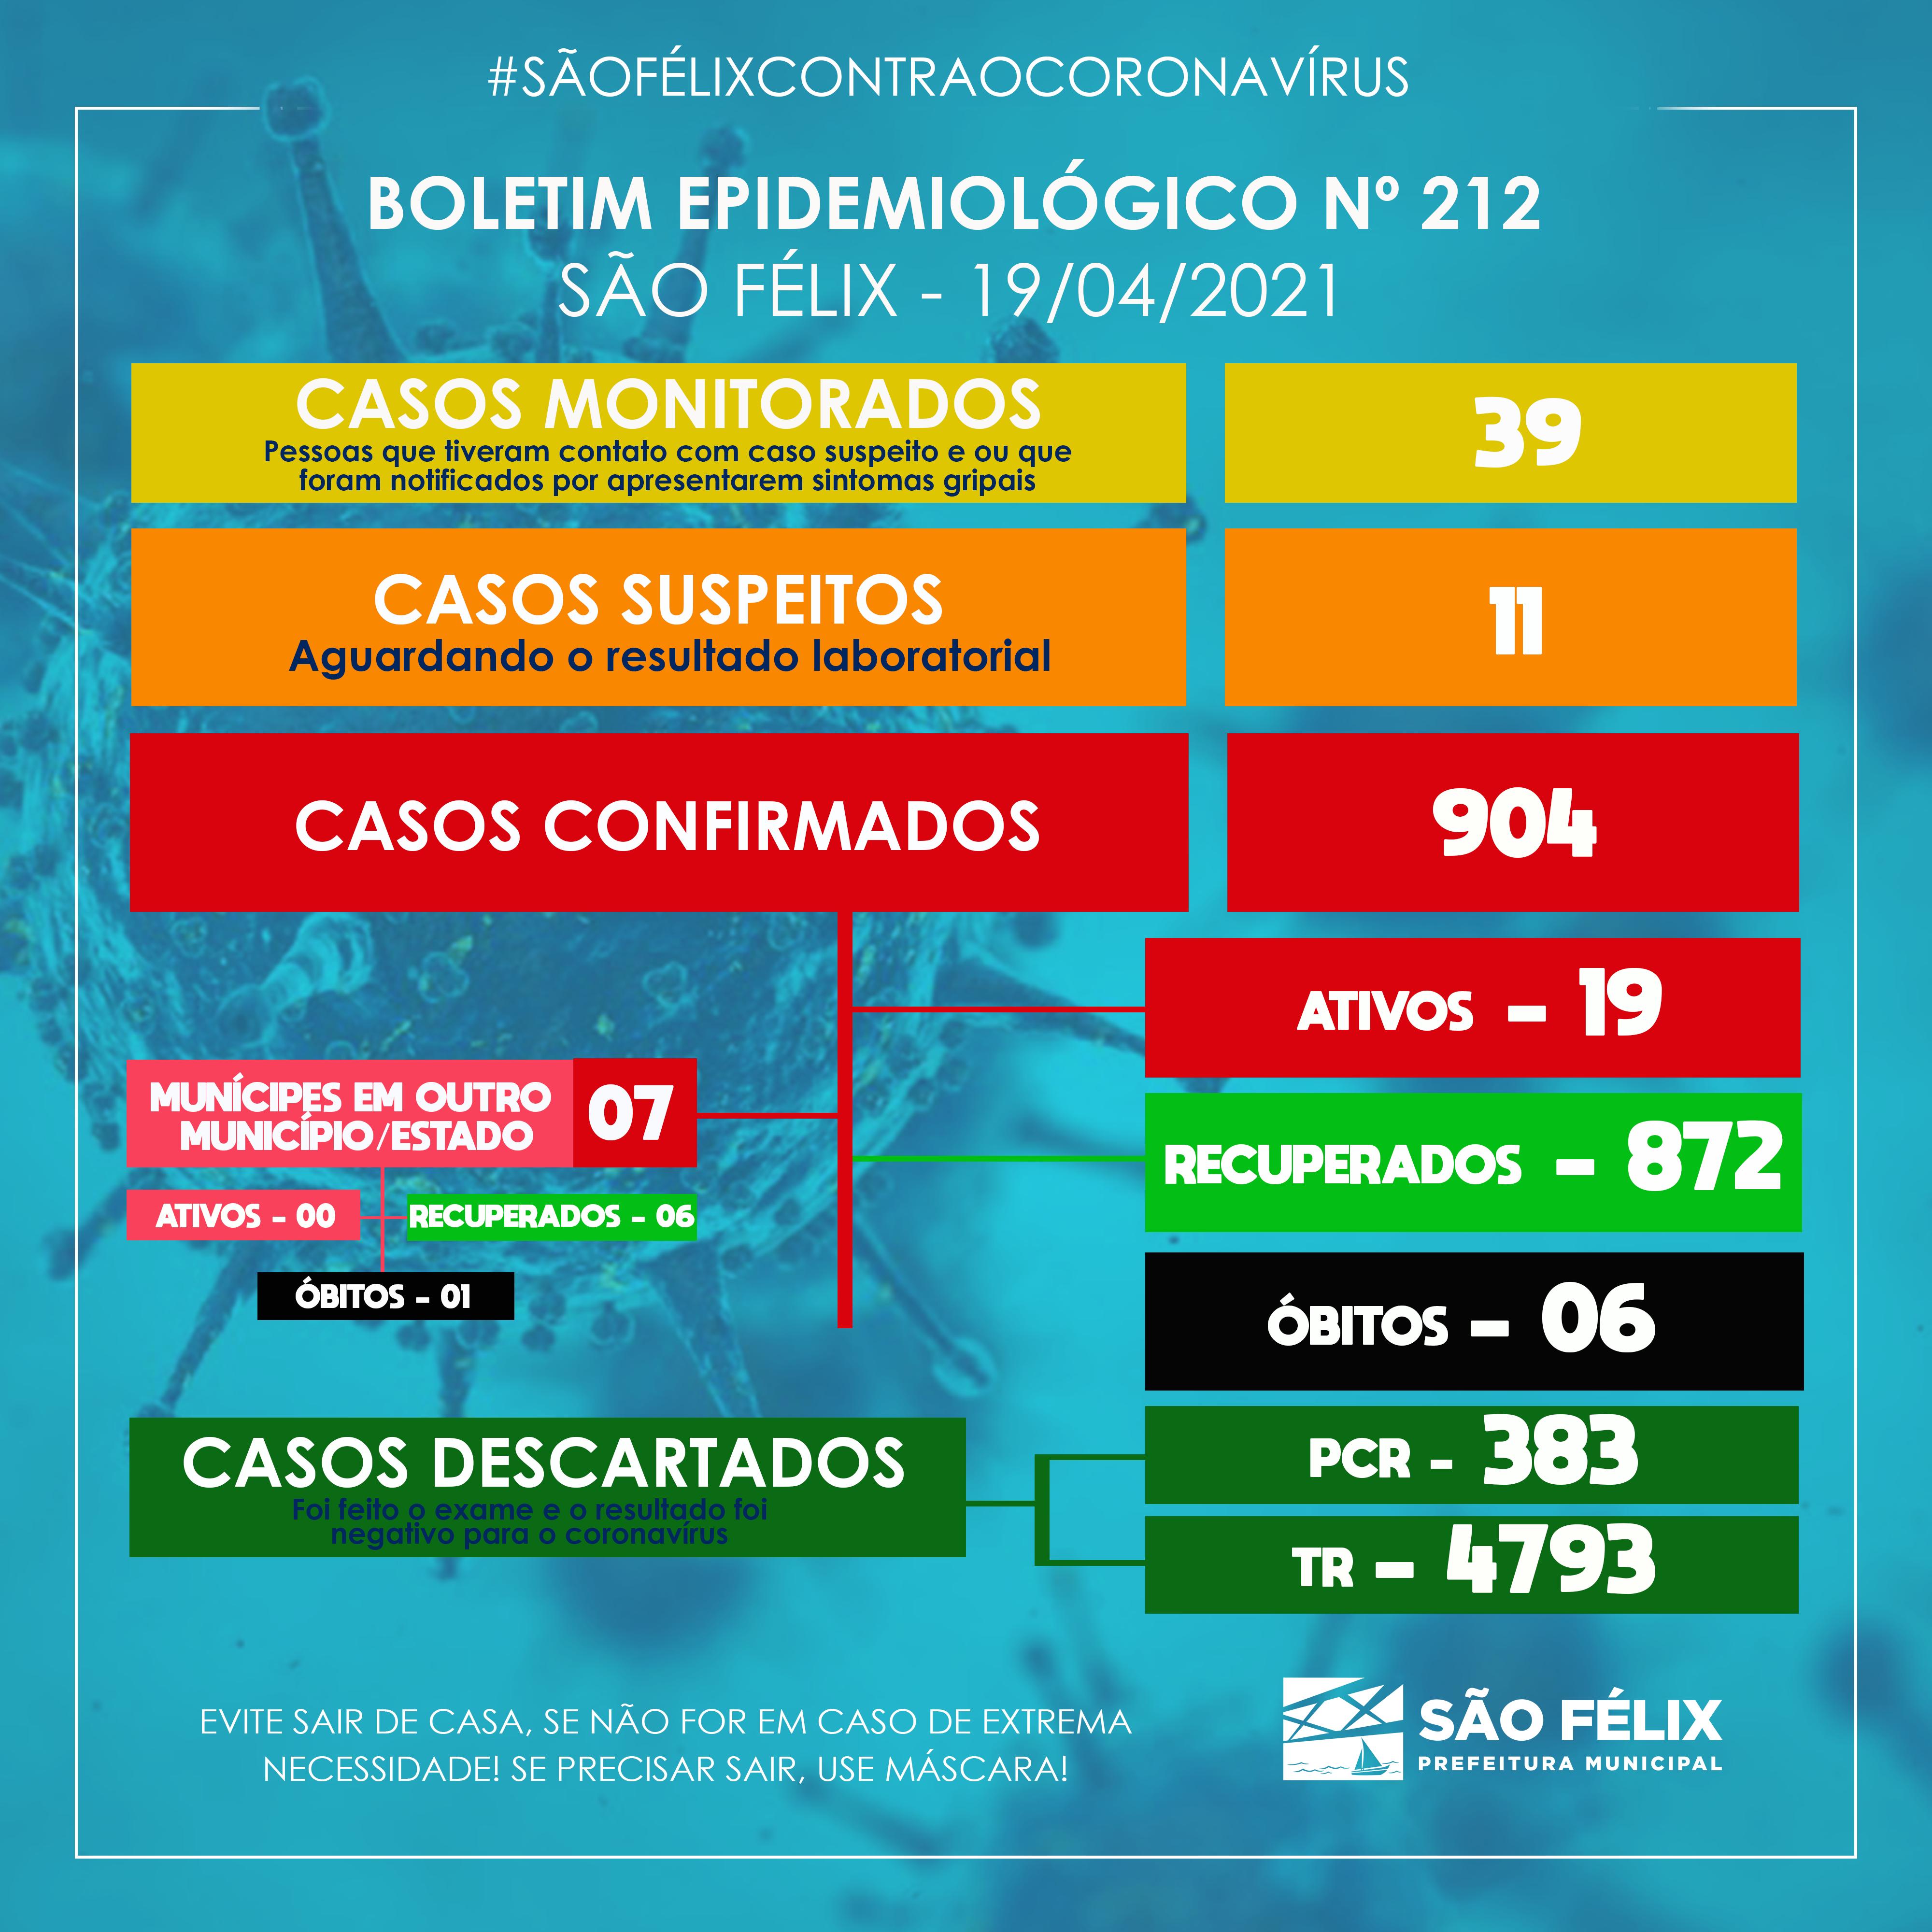 BOLETIM EPIDEMIOLÓGICO Nº 212